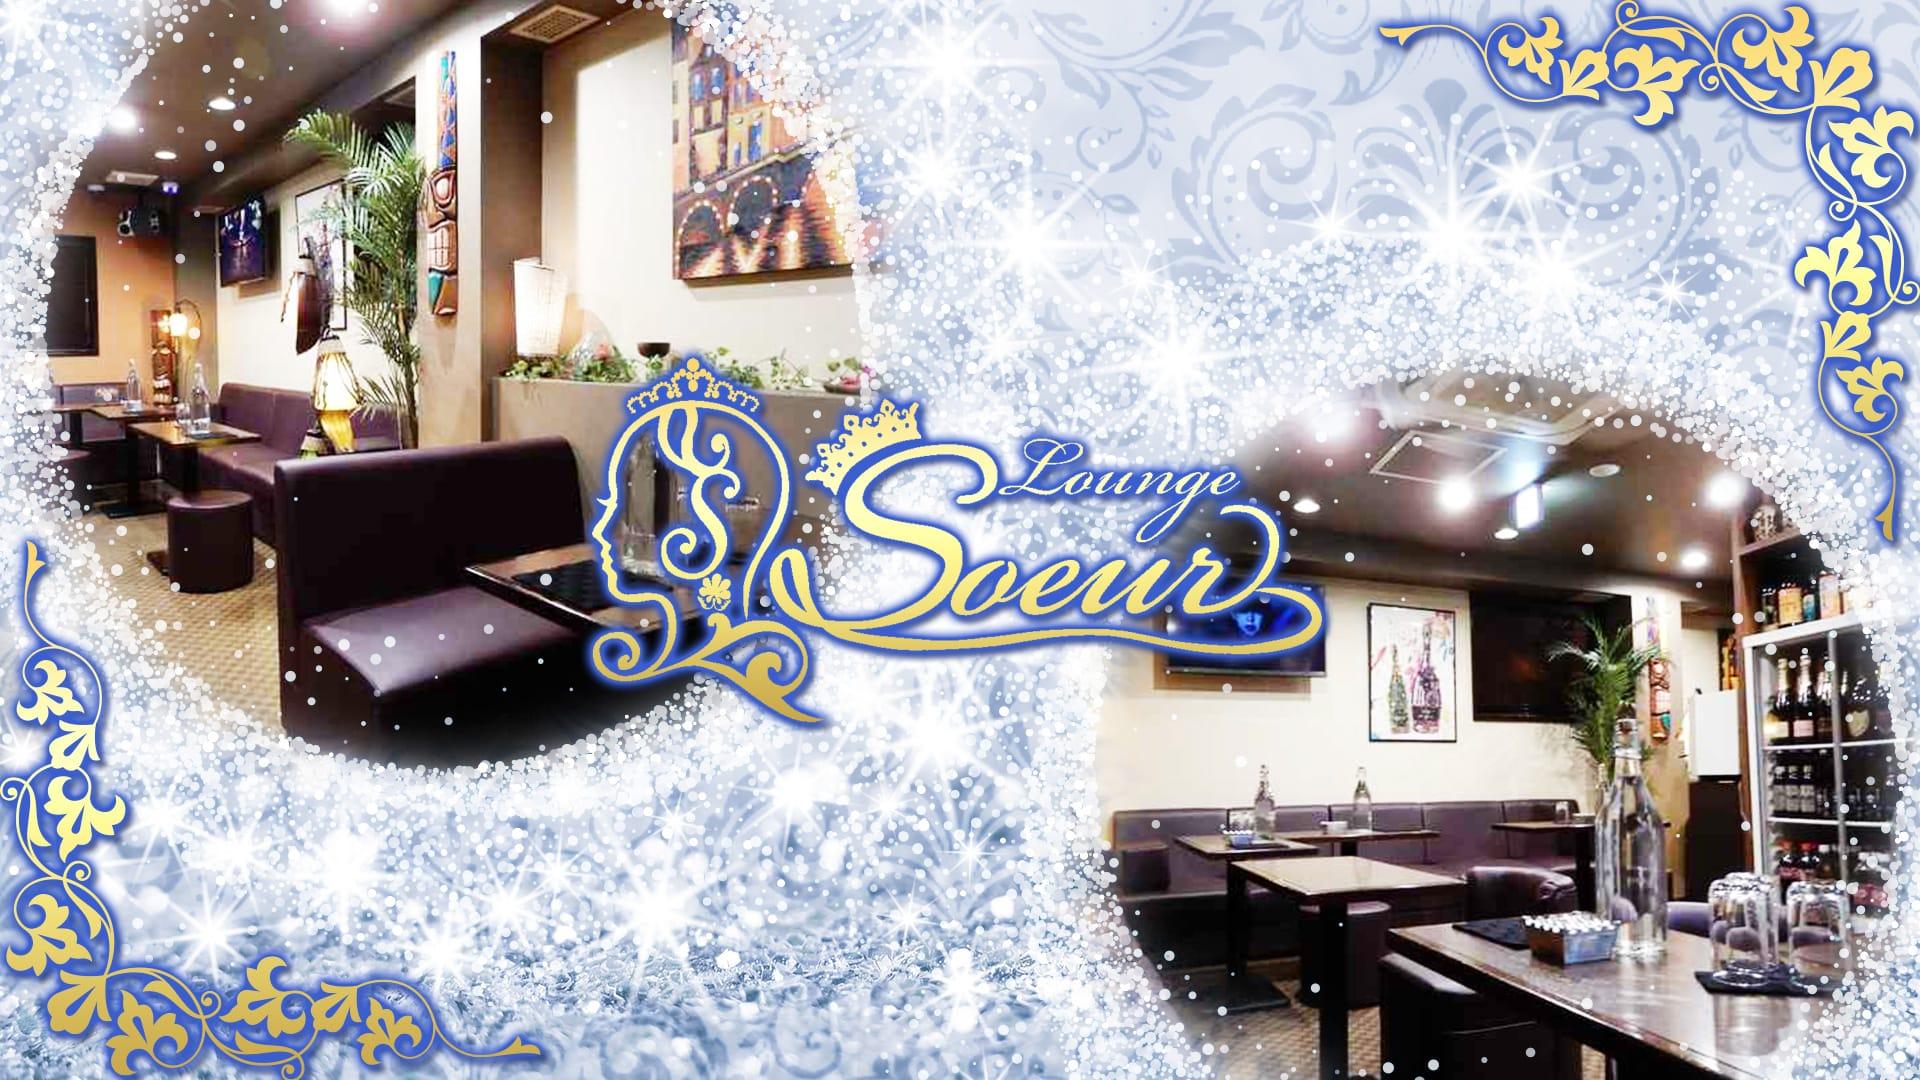 Lounge Soeur(スール) 五井ラウンジ TOP画像